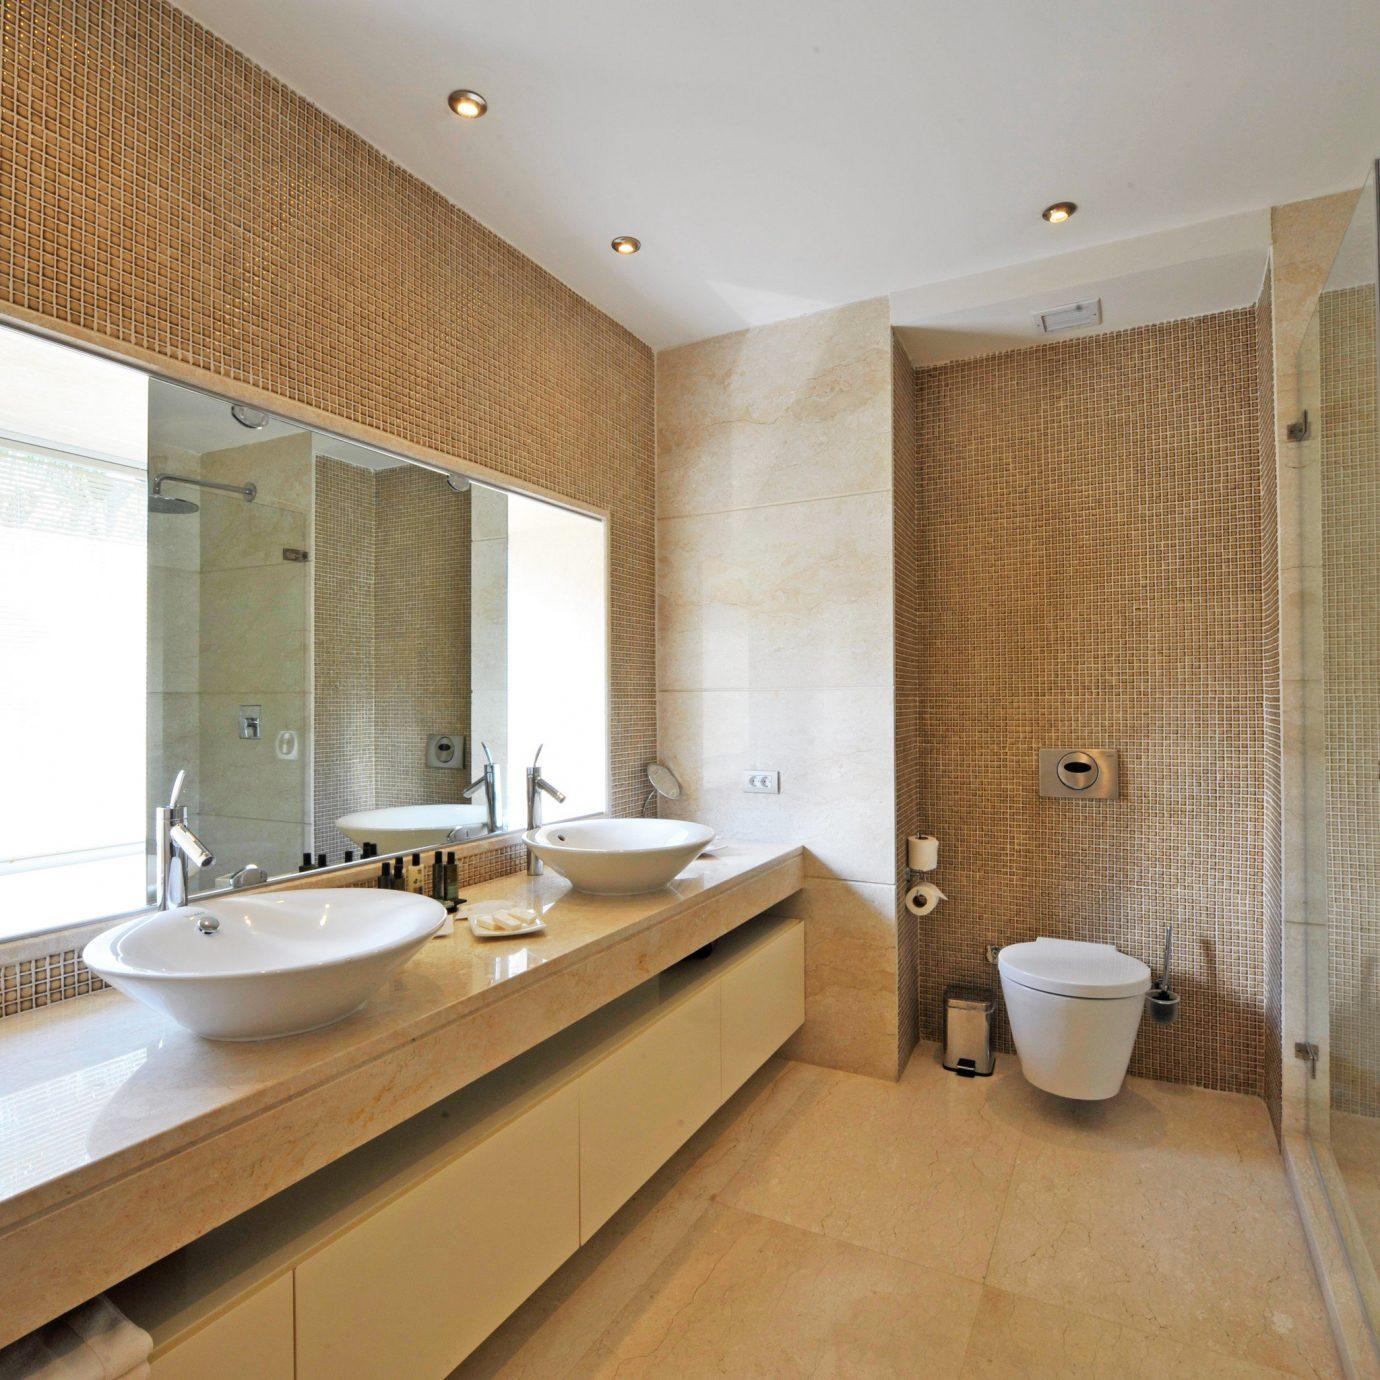 Bath Beach Modern bathroom property sink Suite tub tiled bathtub tile tan